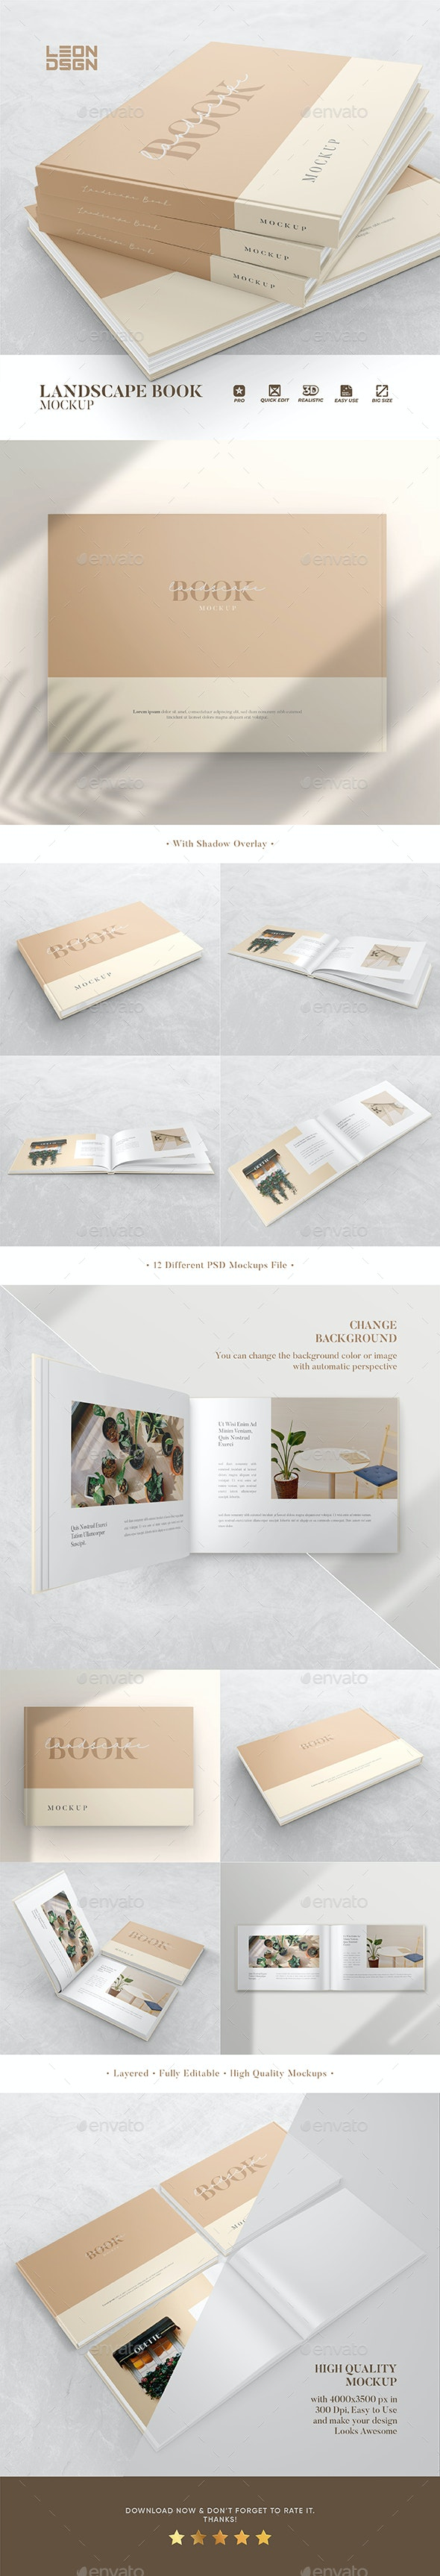 Landscape Book Mockup - Books Print